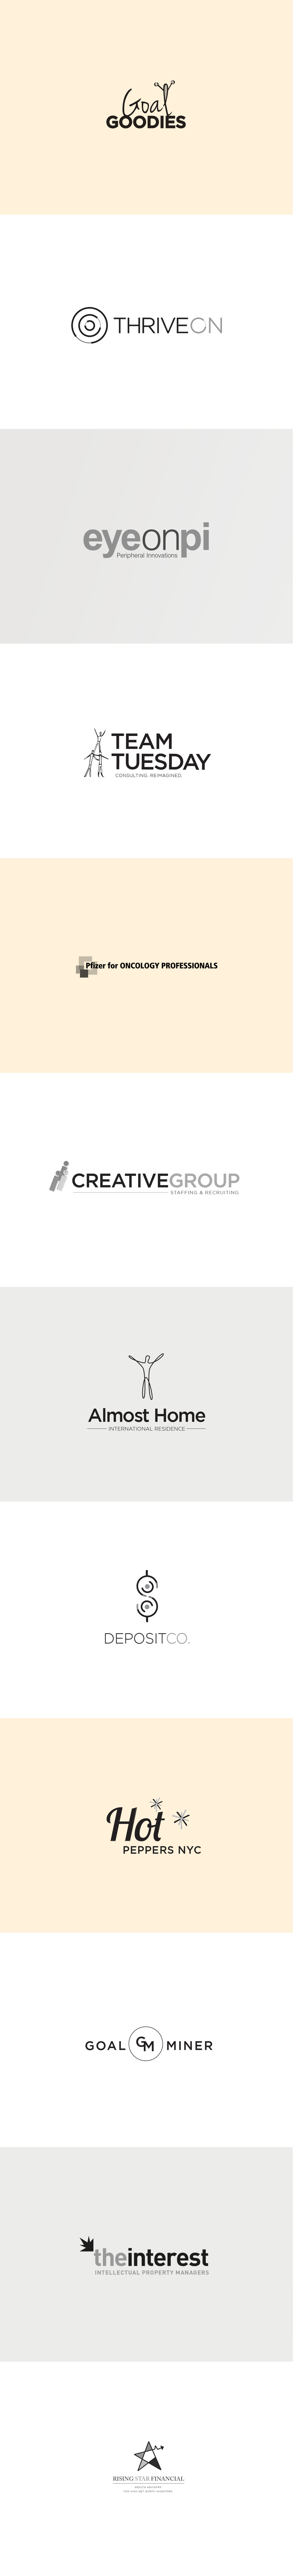 Identity_Design_logos.jpg